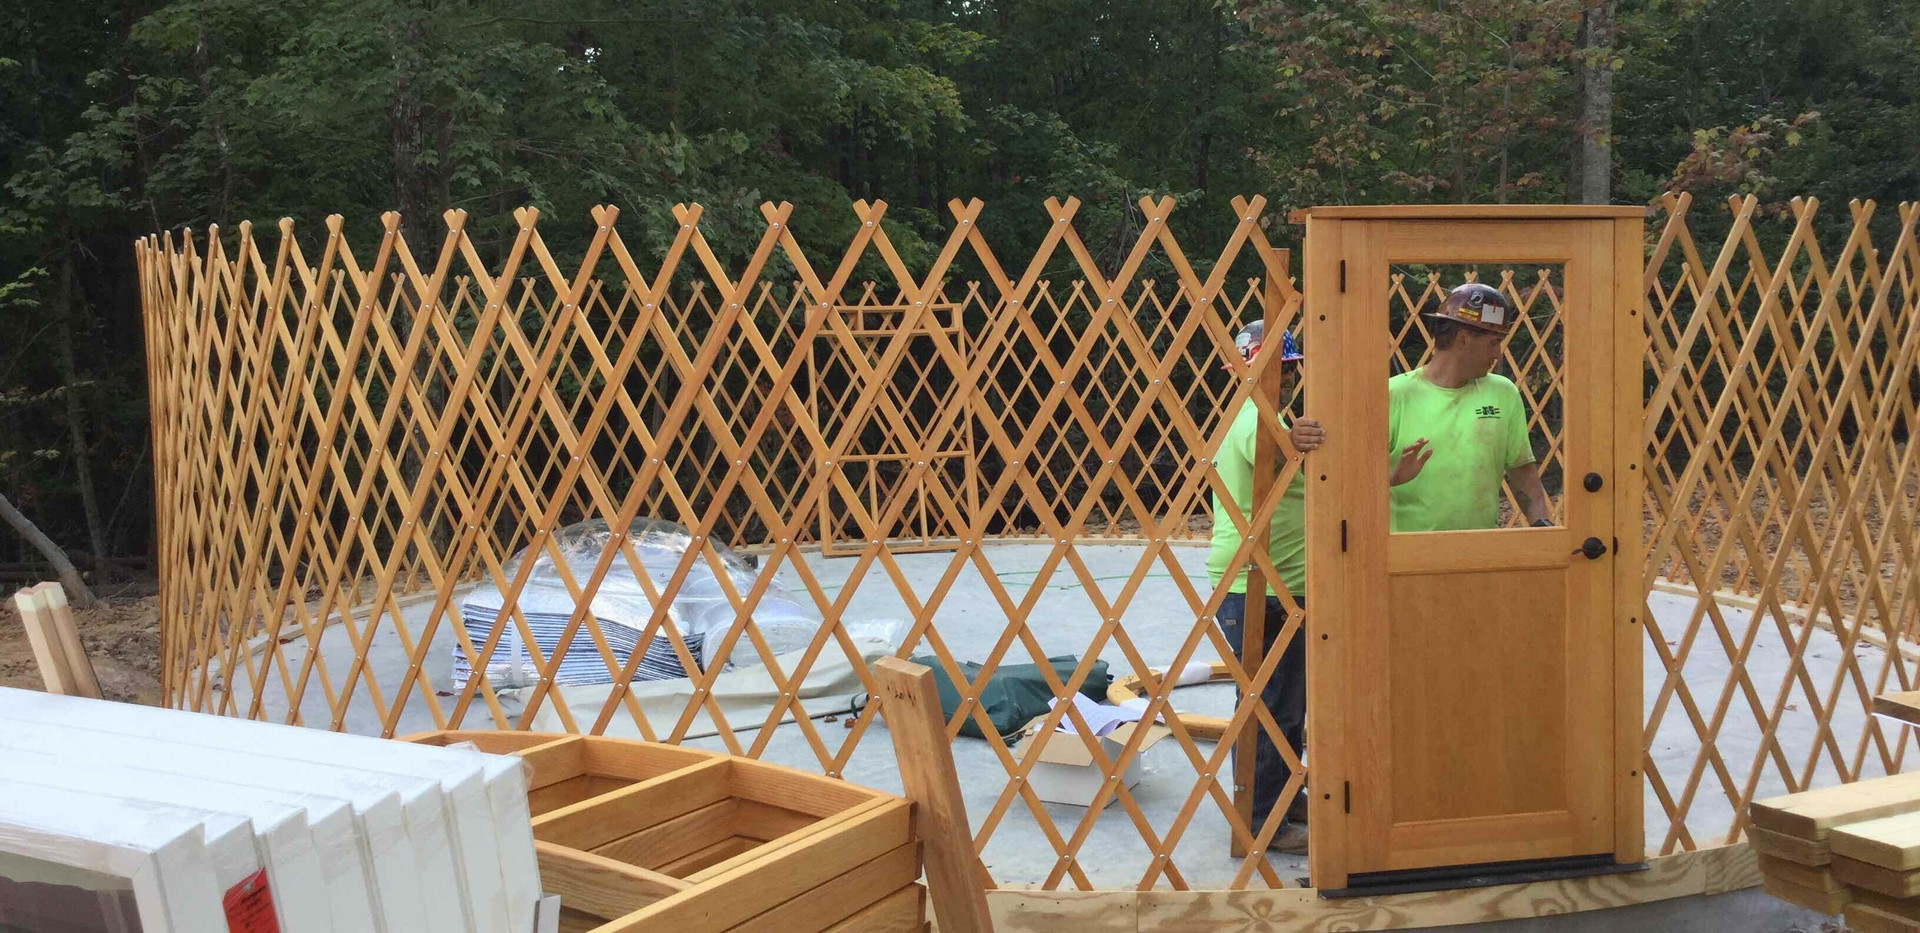 Yurt Construction - View 3